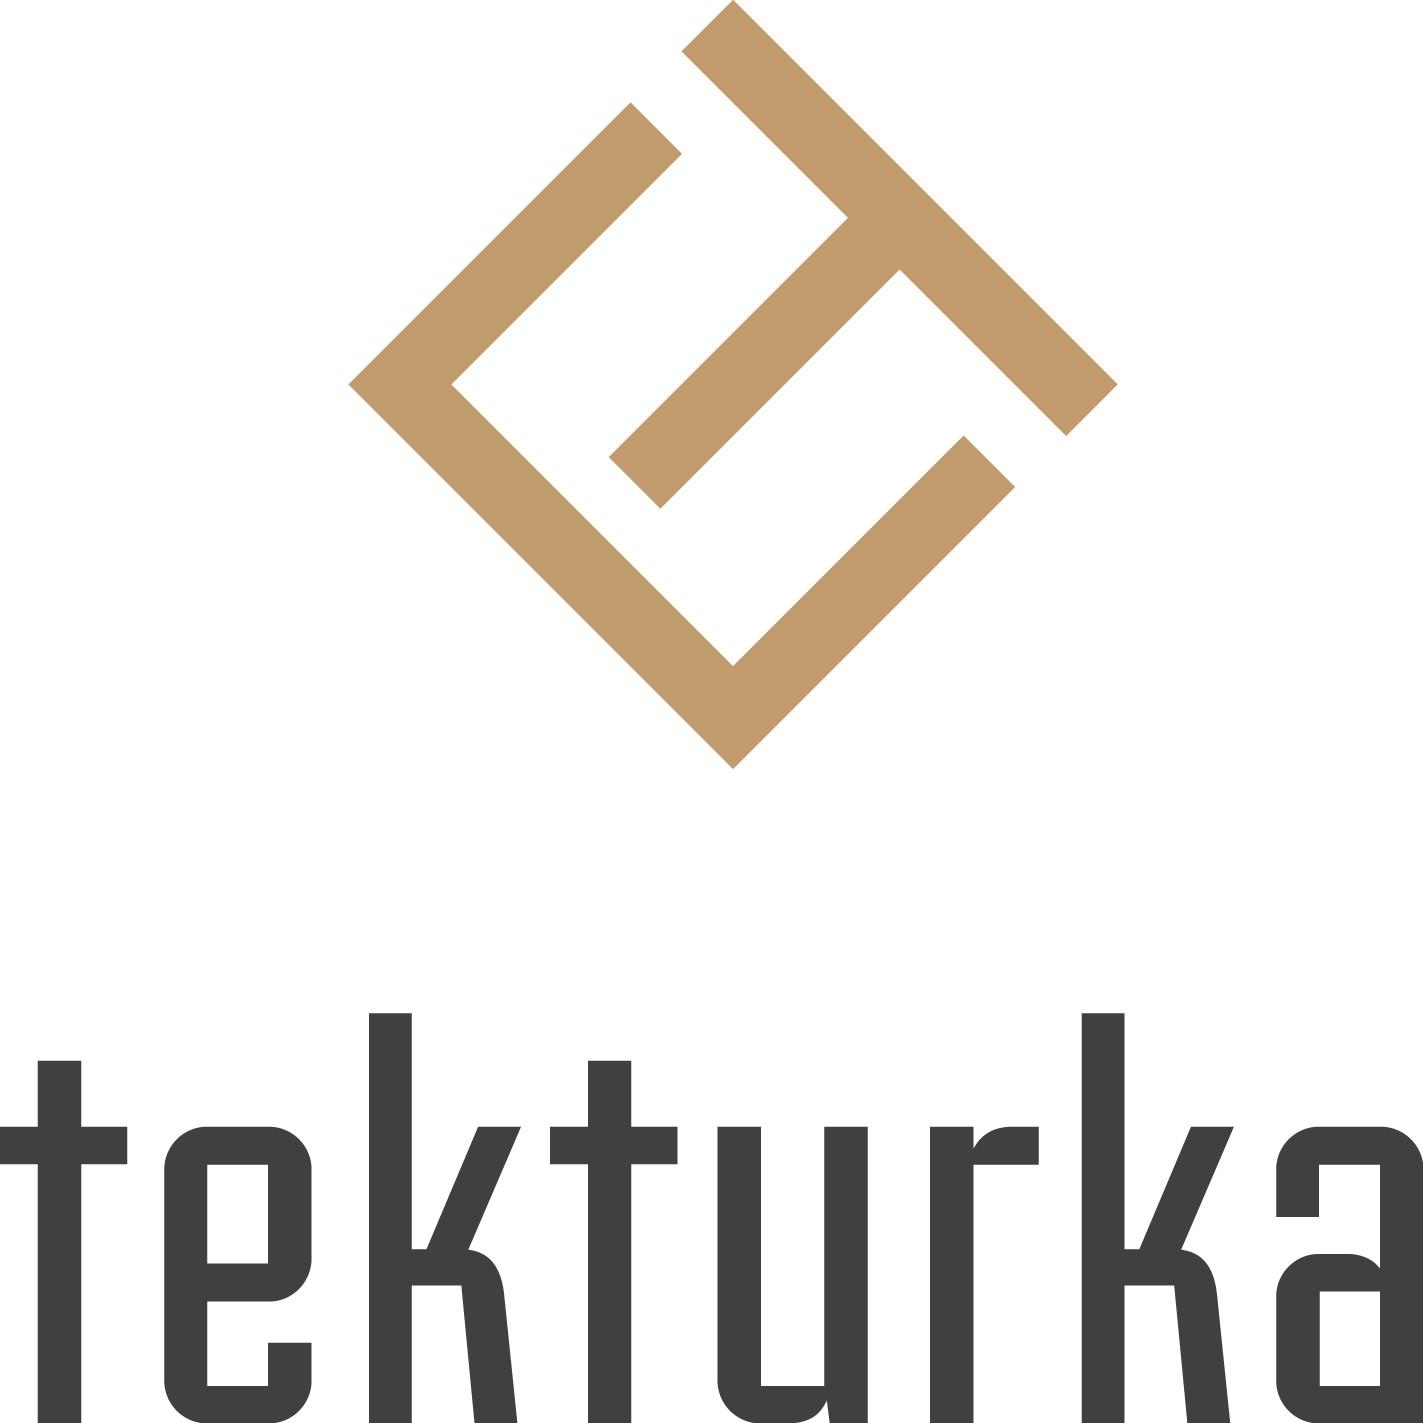 TEKTURKA